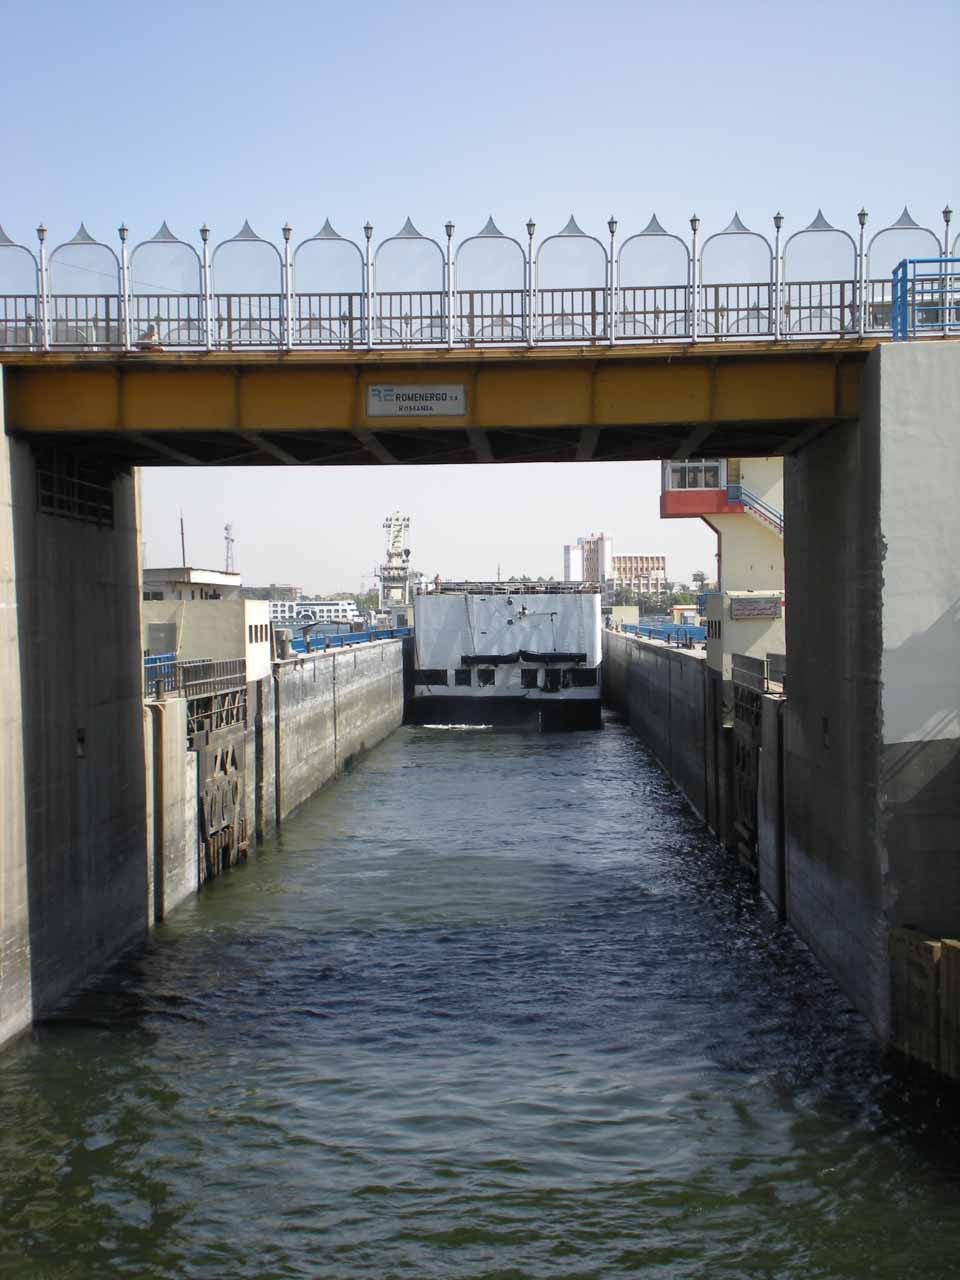 Entering the Esna Lock